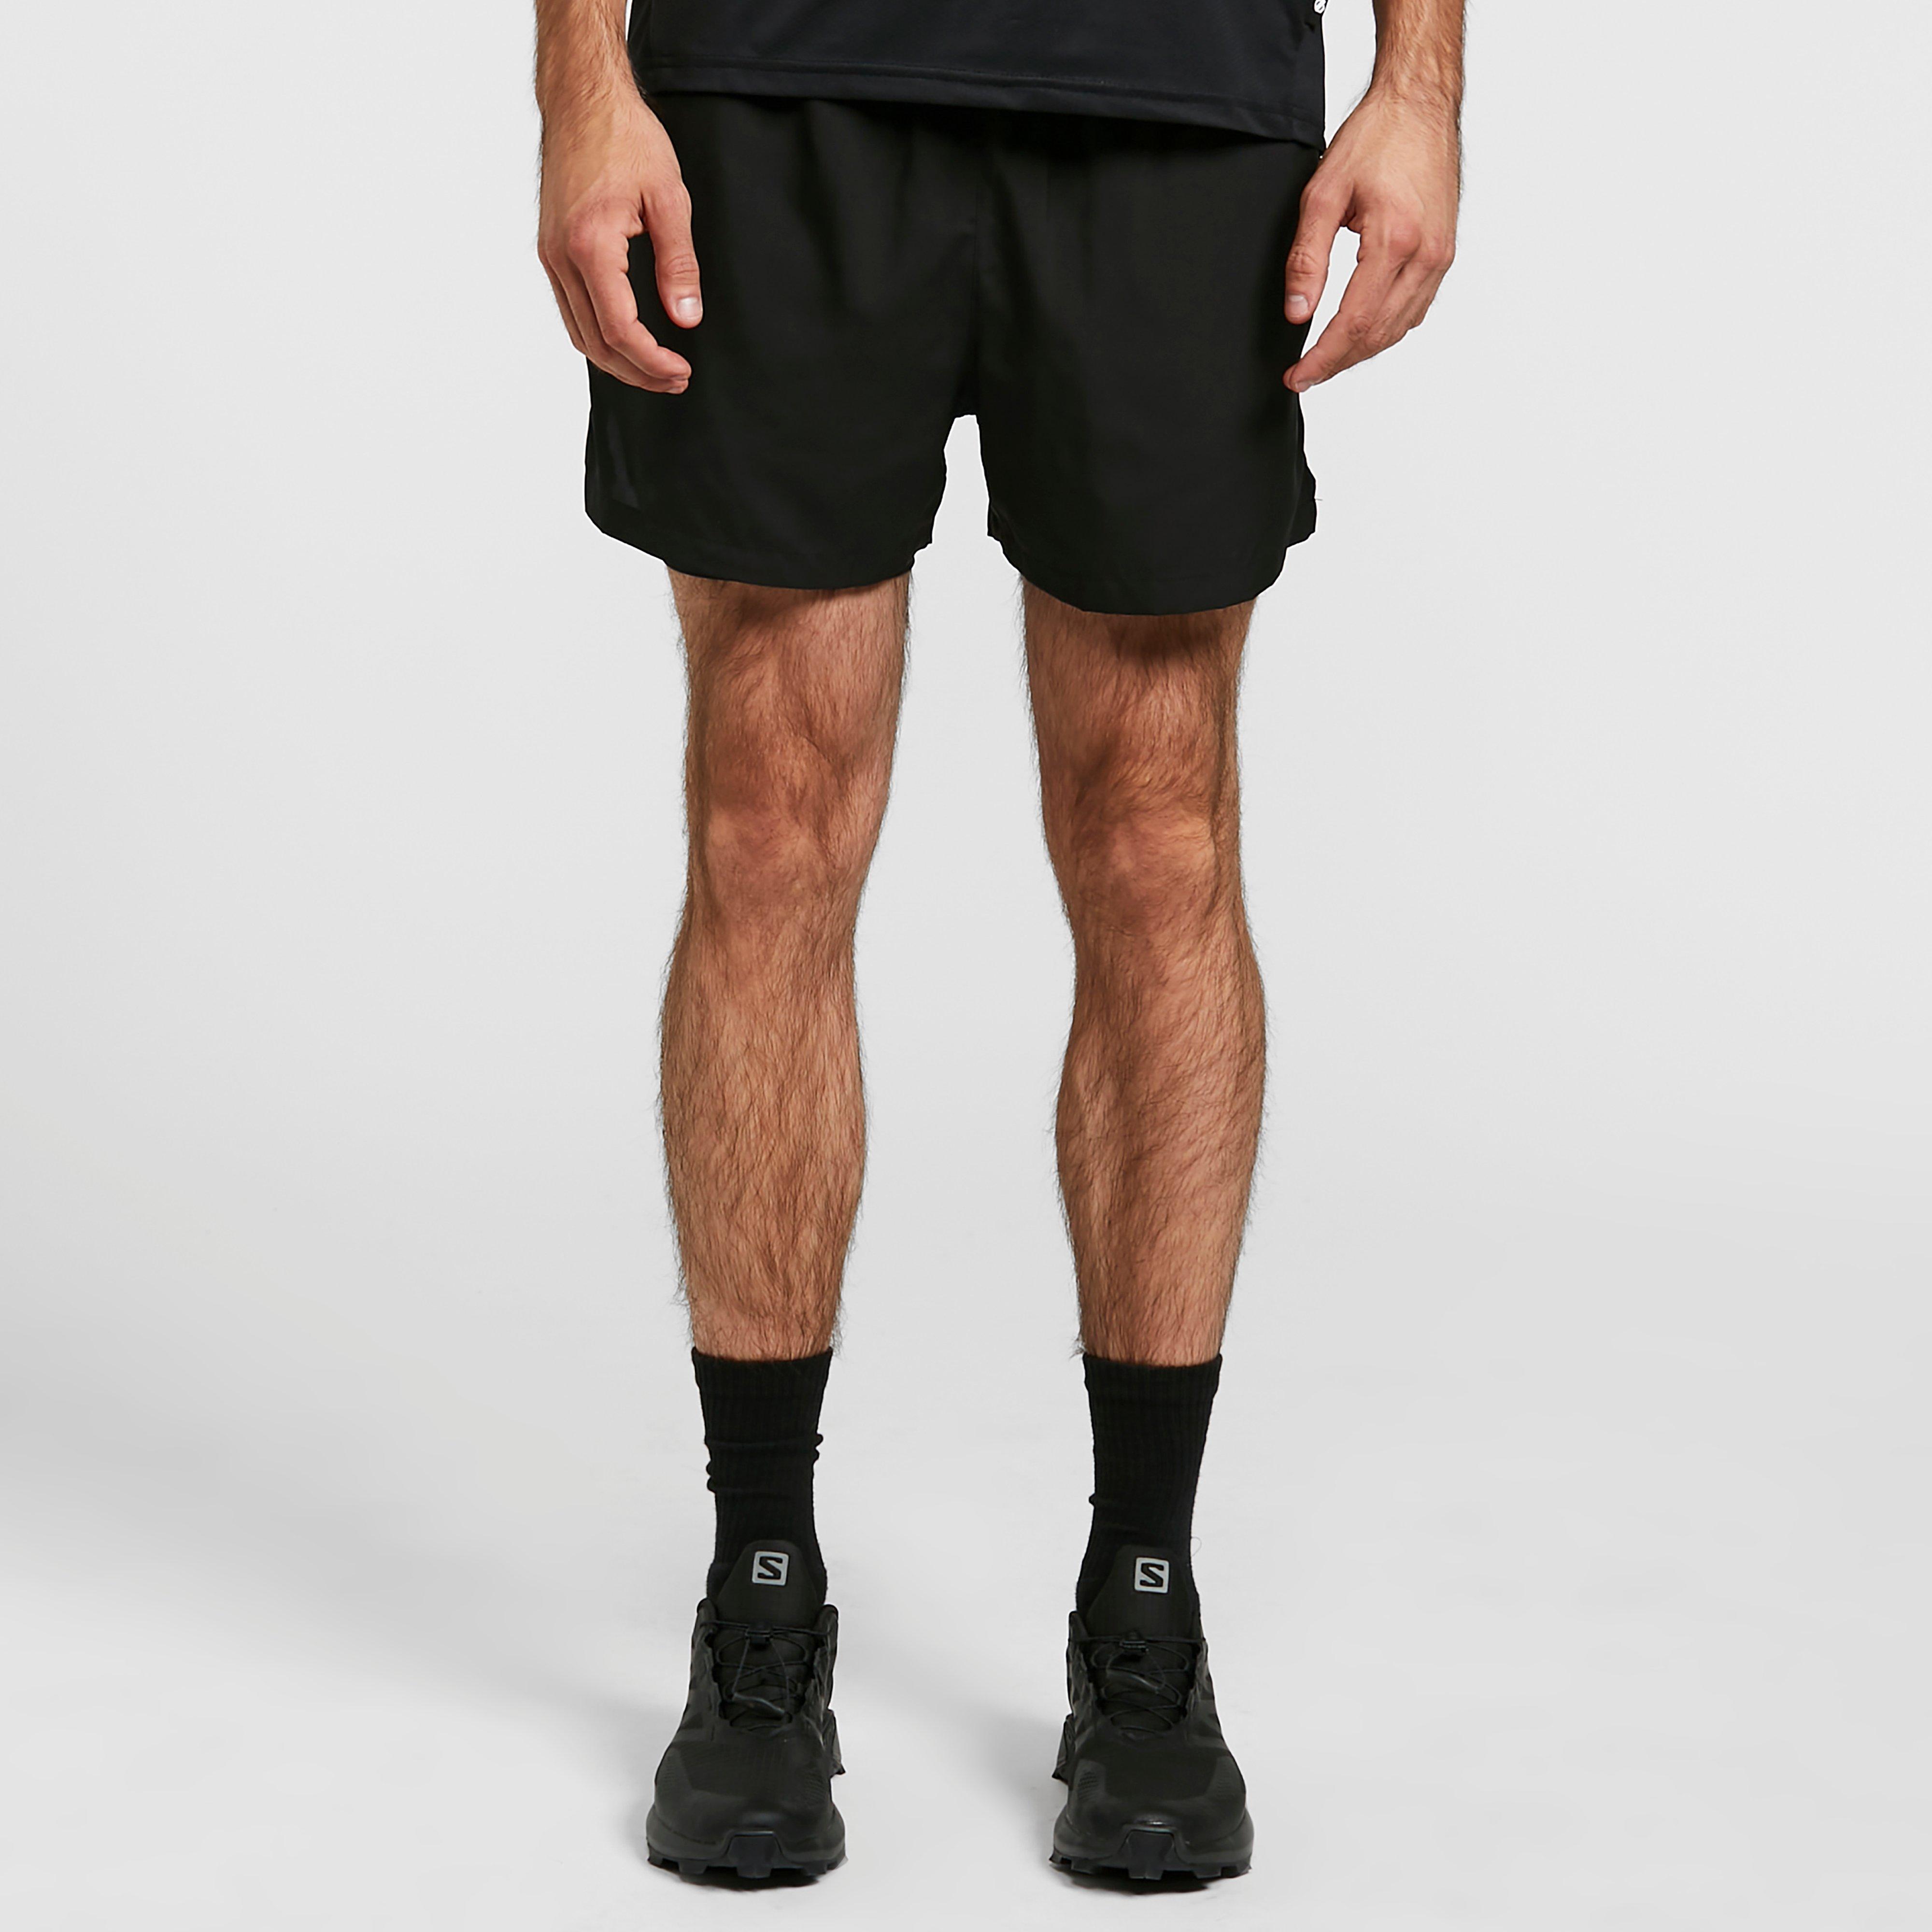 Dare 2B Men's Recreate Shorts - Black/Black, Black